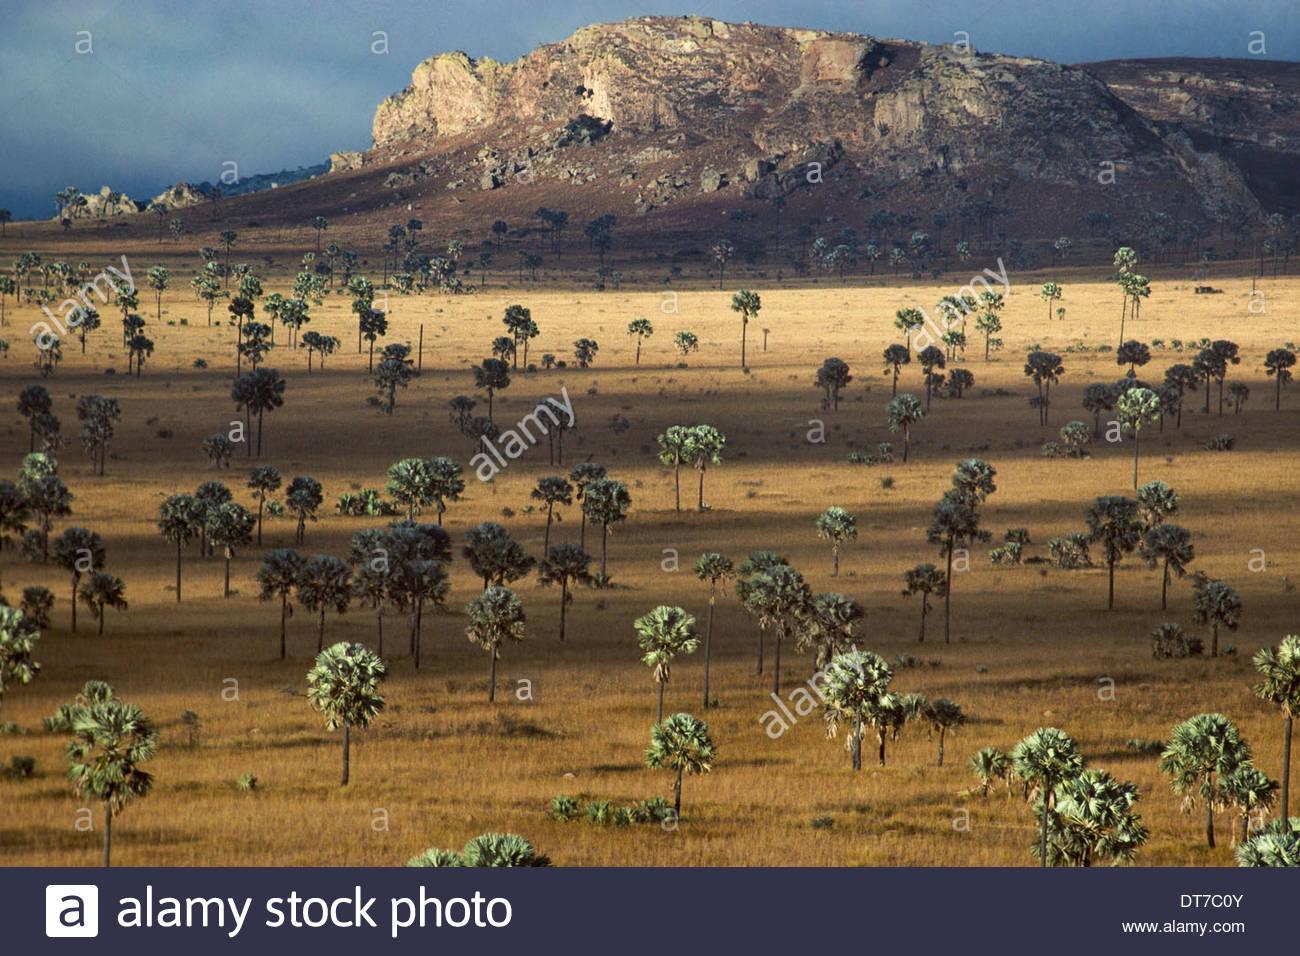 Palm-Savanne Horombe Plateau südlichen Madagaskar Palme Savanne Horombe Plateau Süd-Madagaskar Stockbild